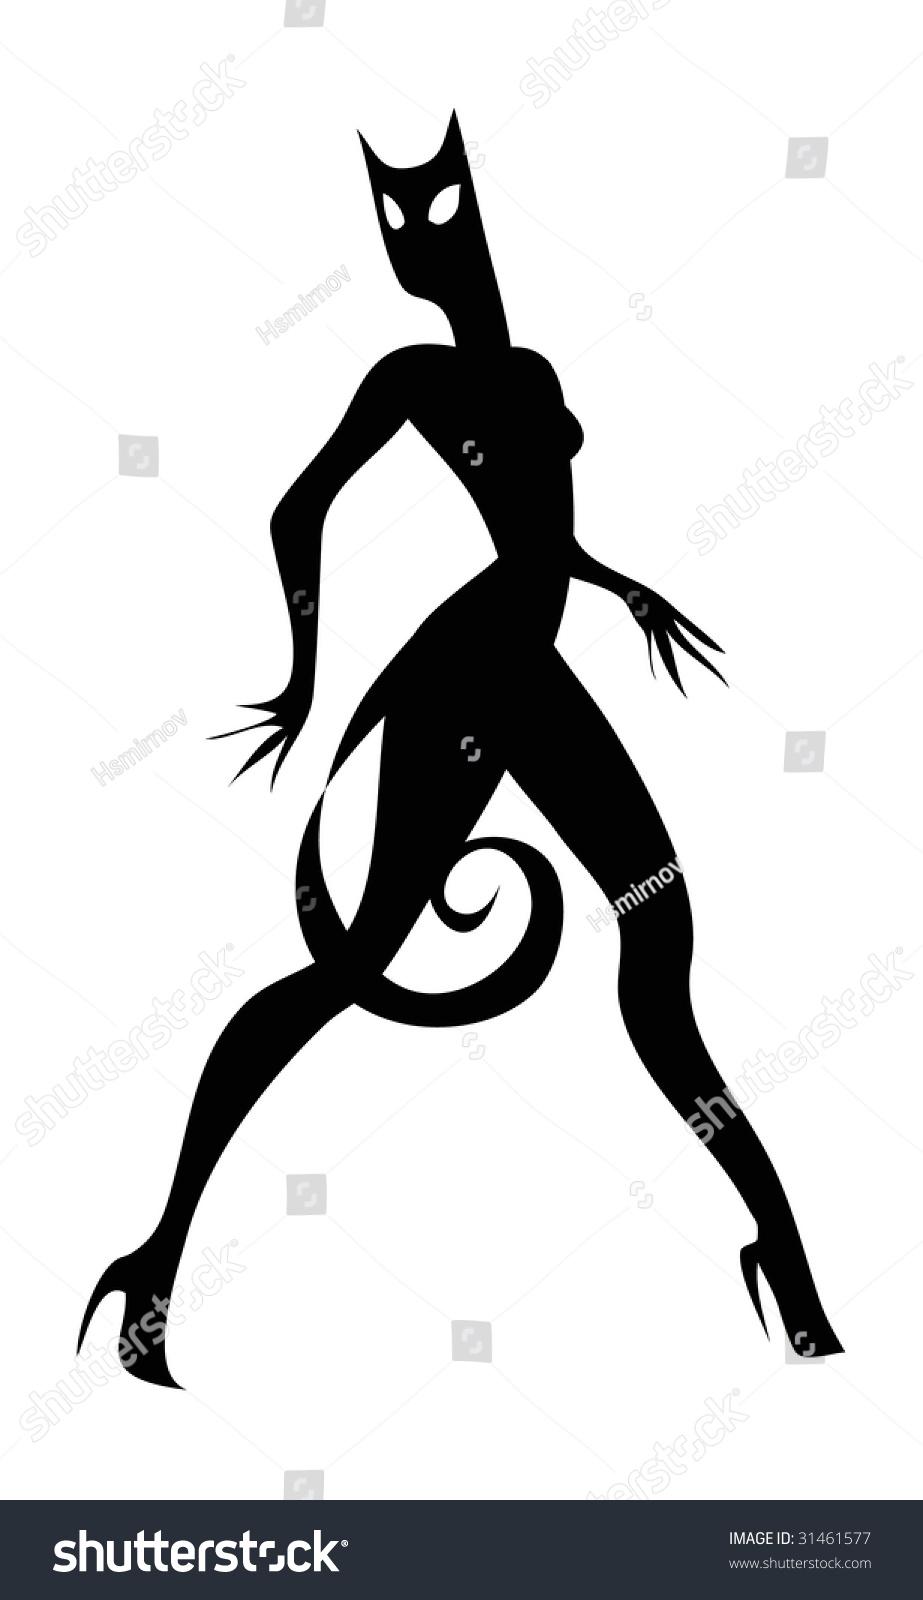 Naked mens calender